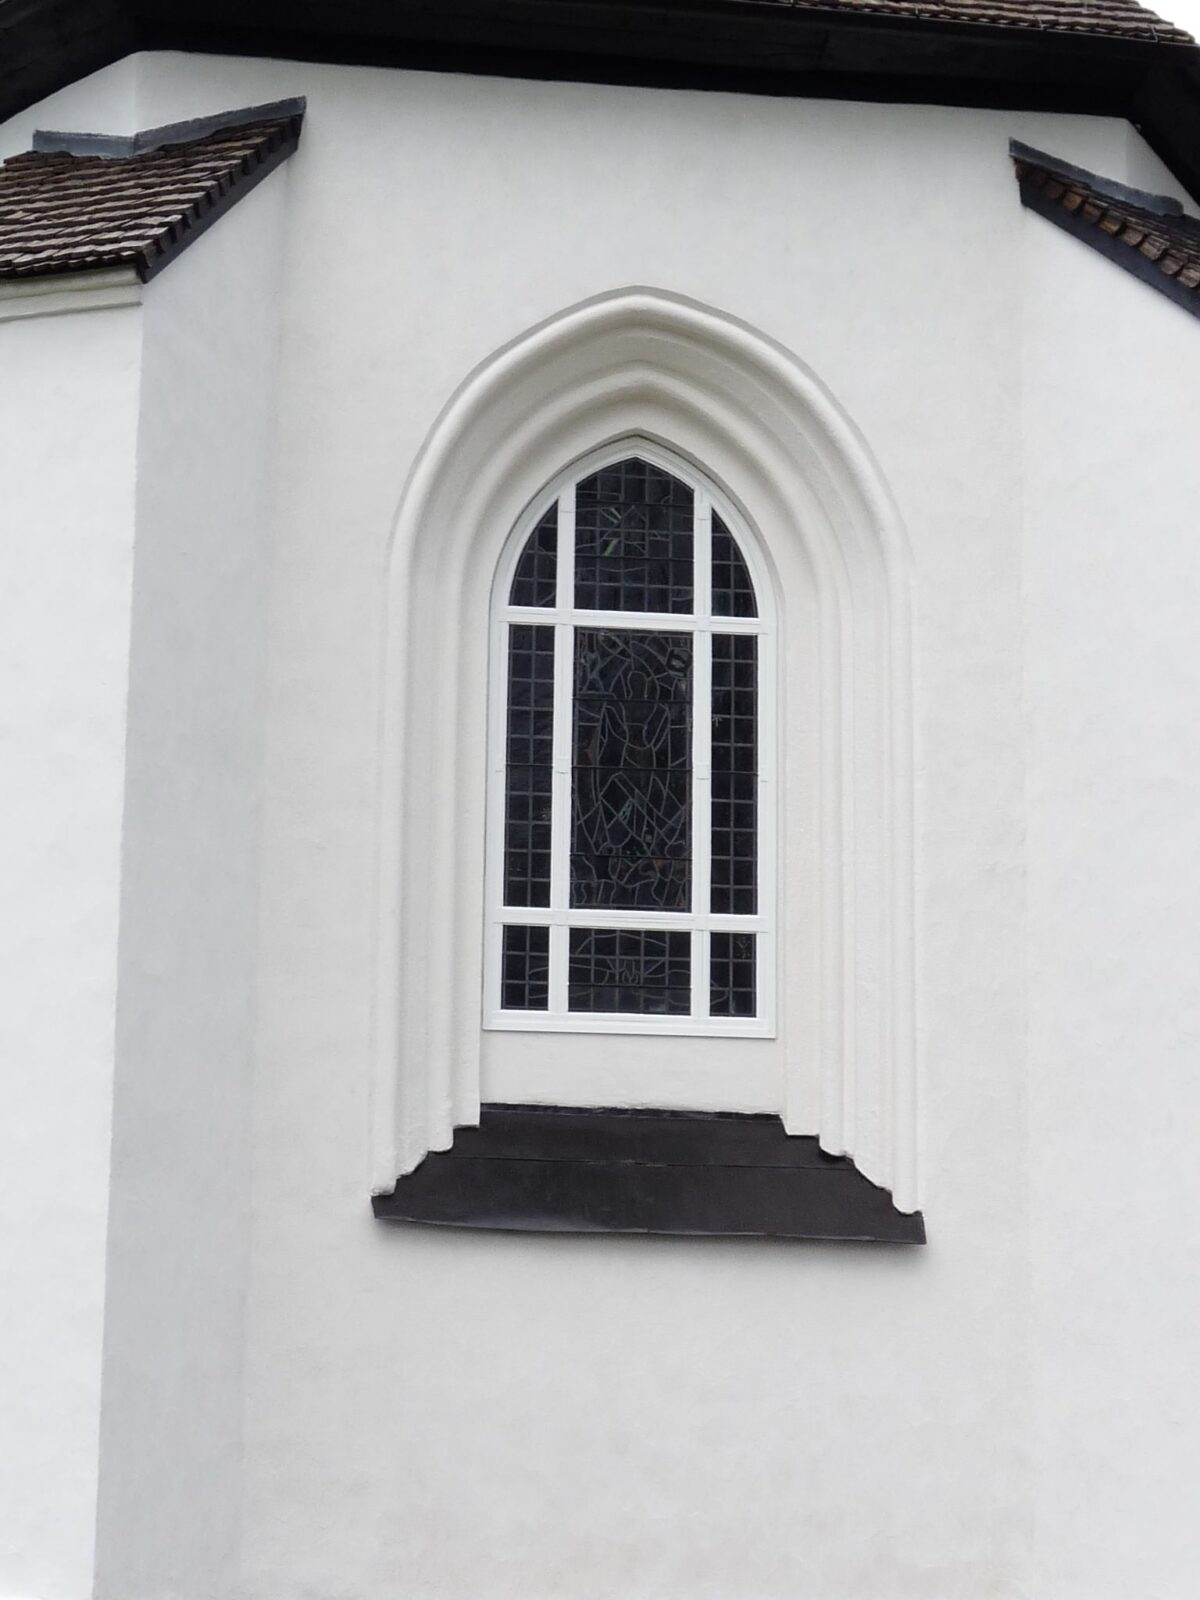 Askeby kyrka-P1030272-e1352223300928